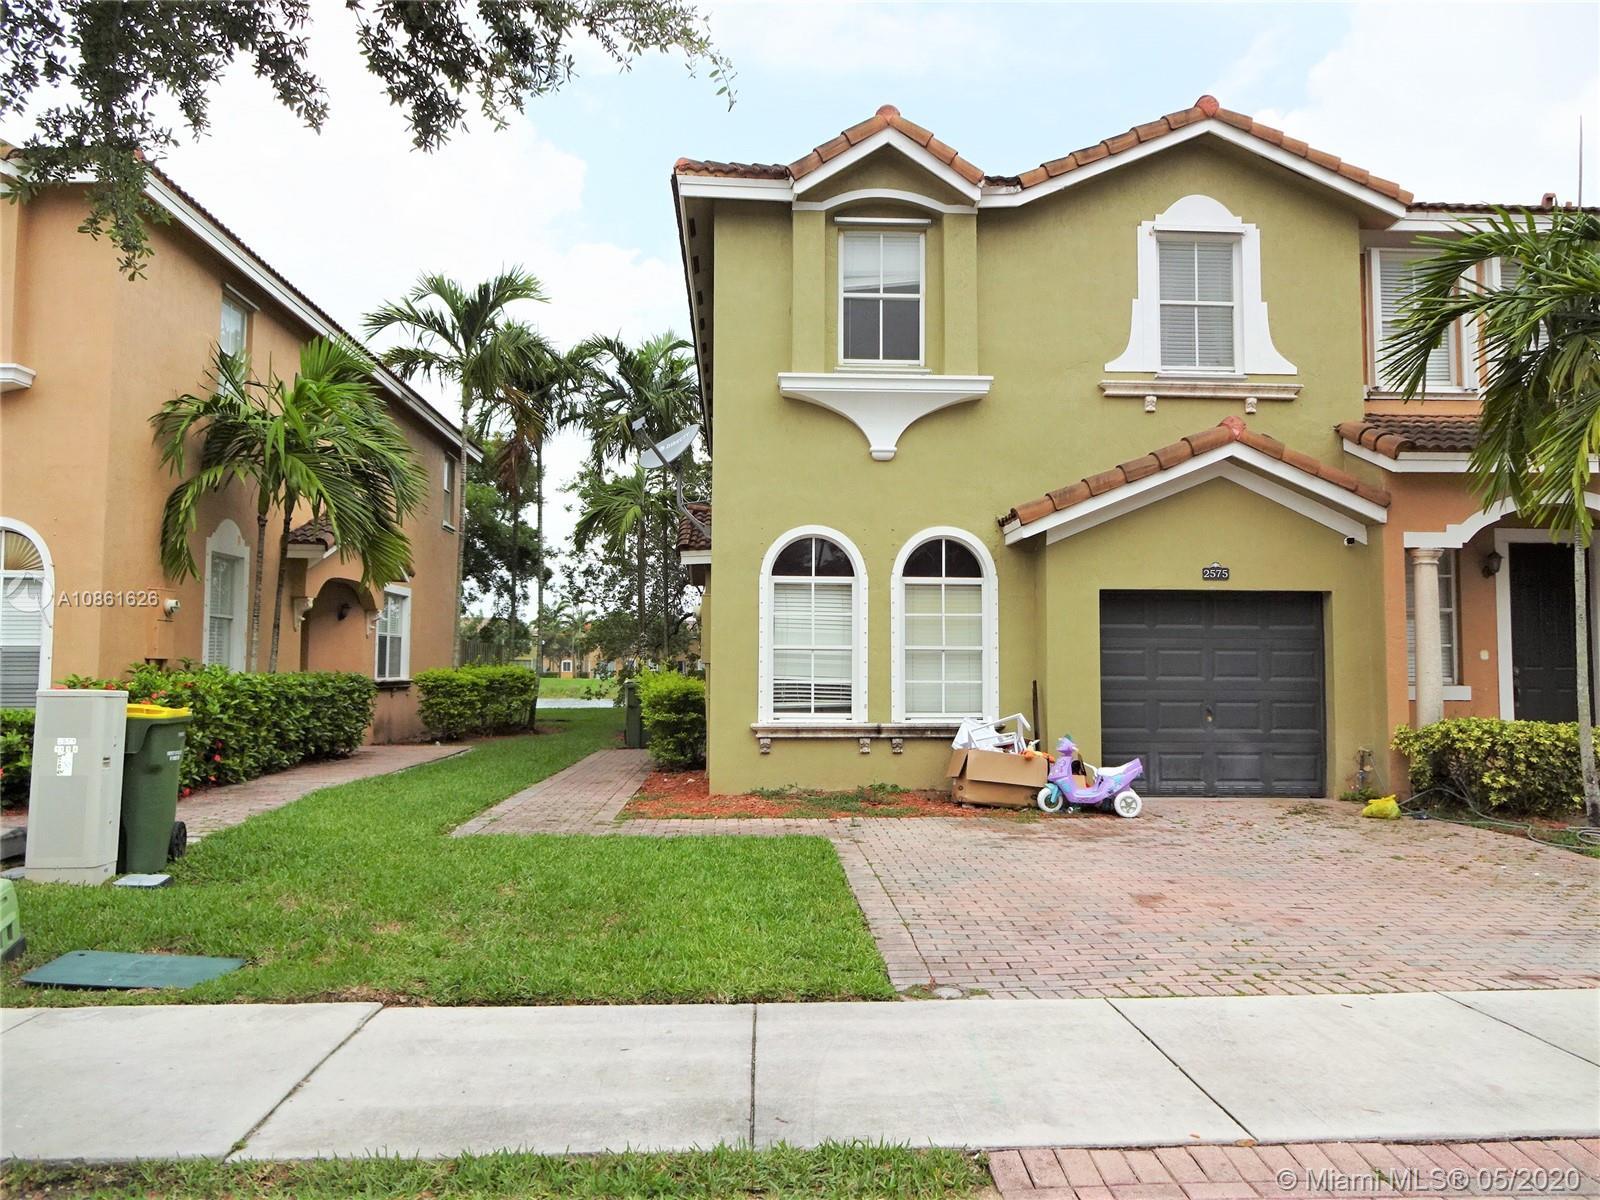 2575 SE 13th Ct, Homestead, FL 33035 - Homestead, FL real estate listing